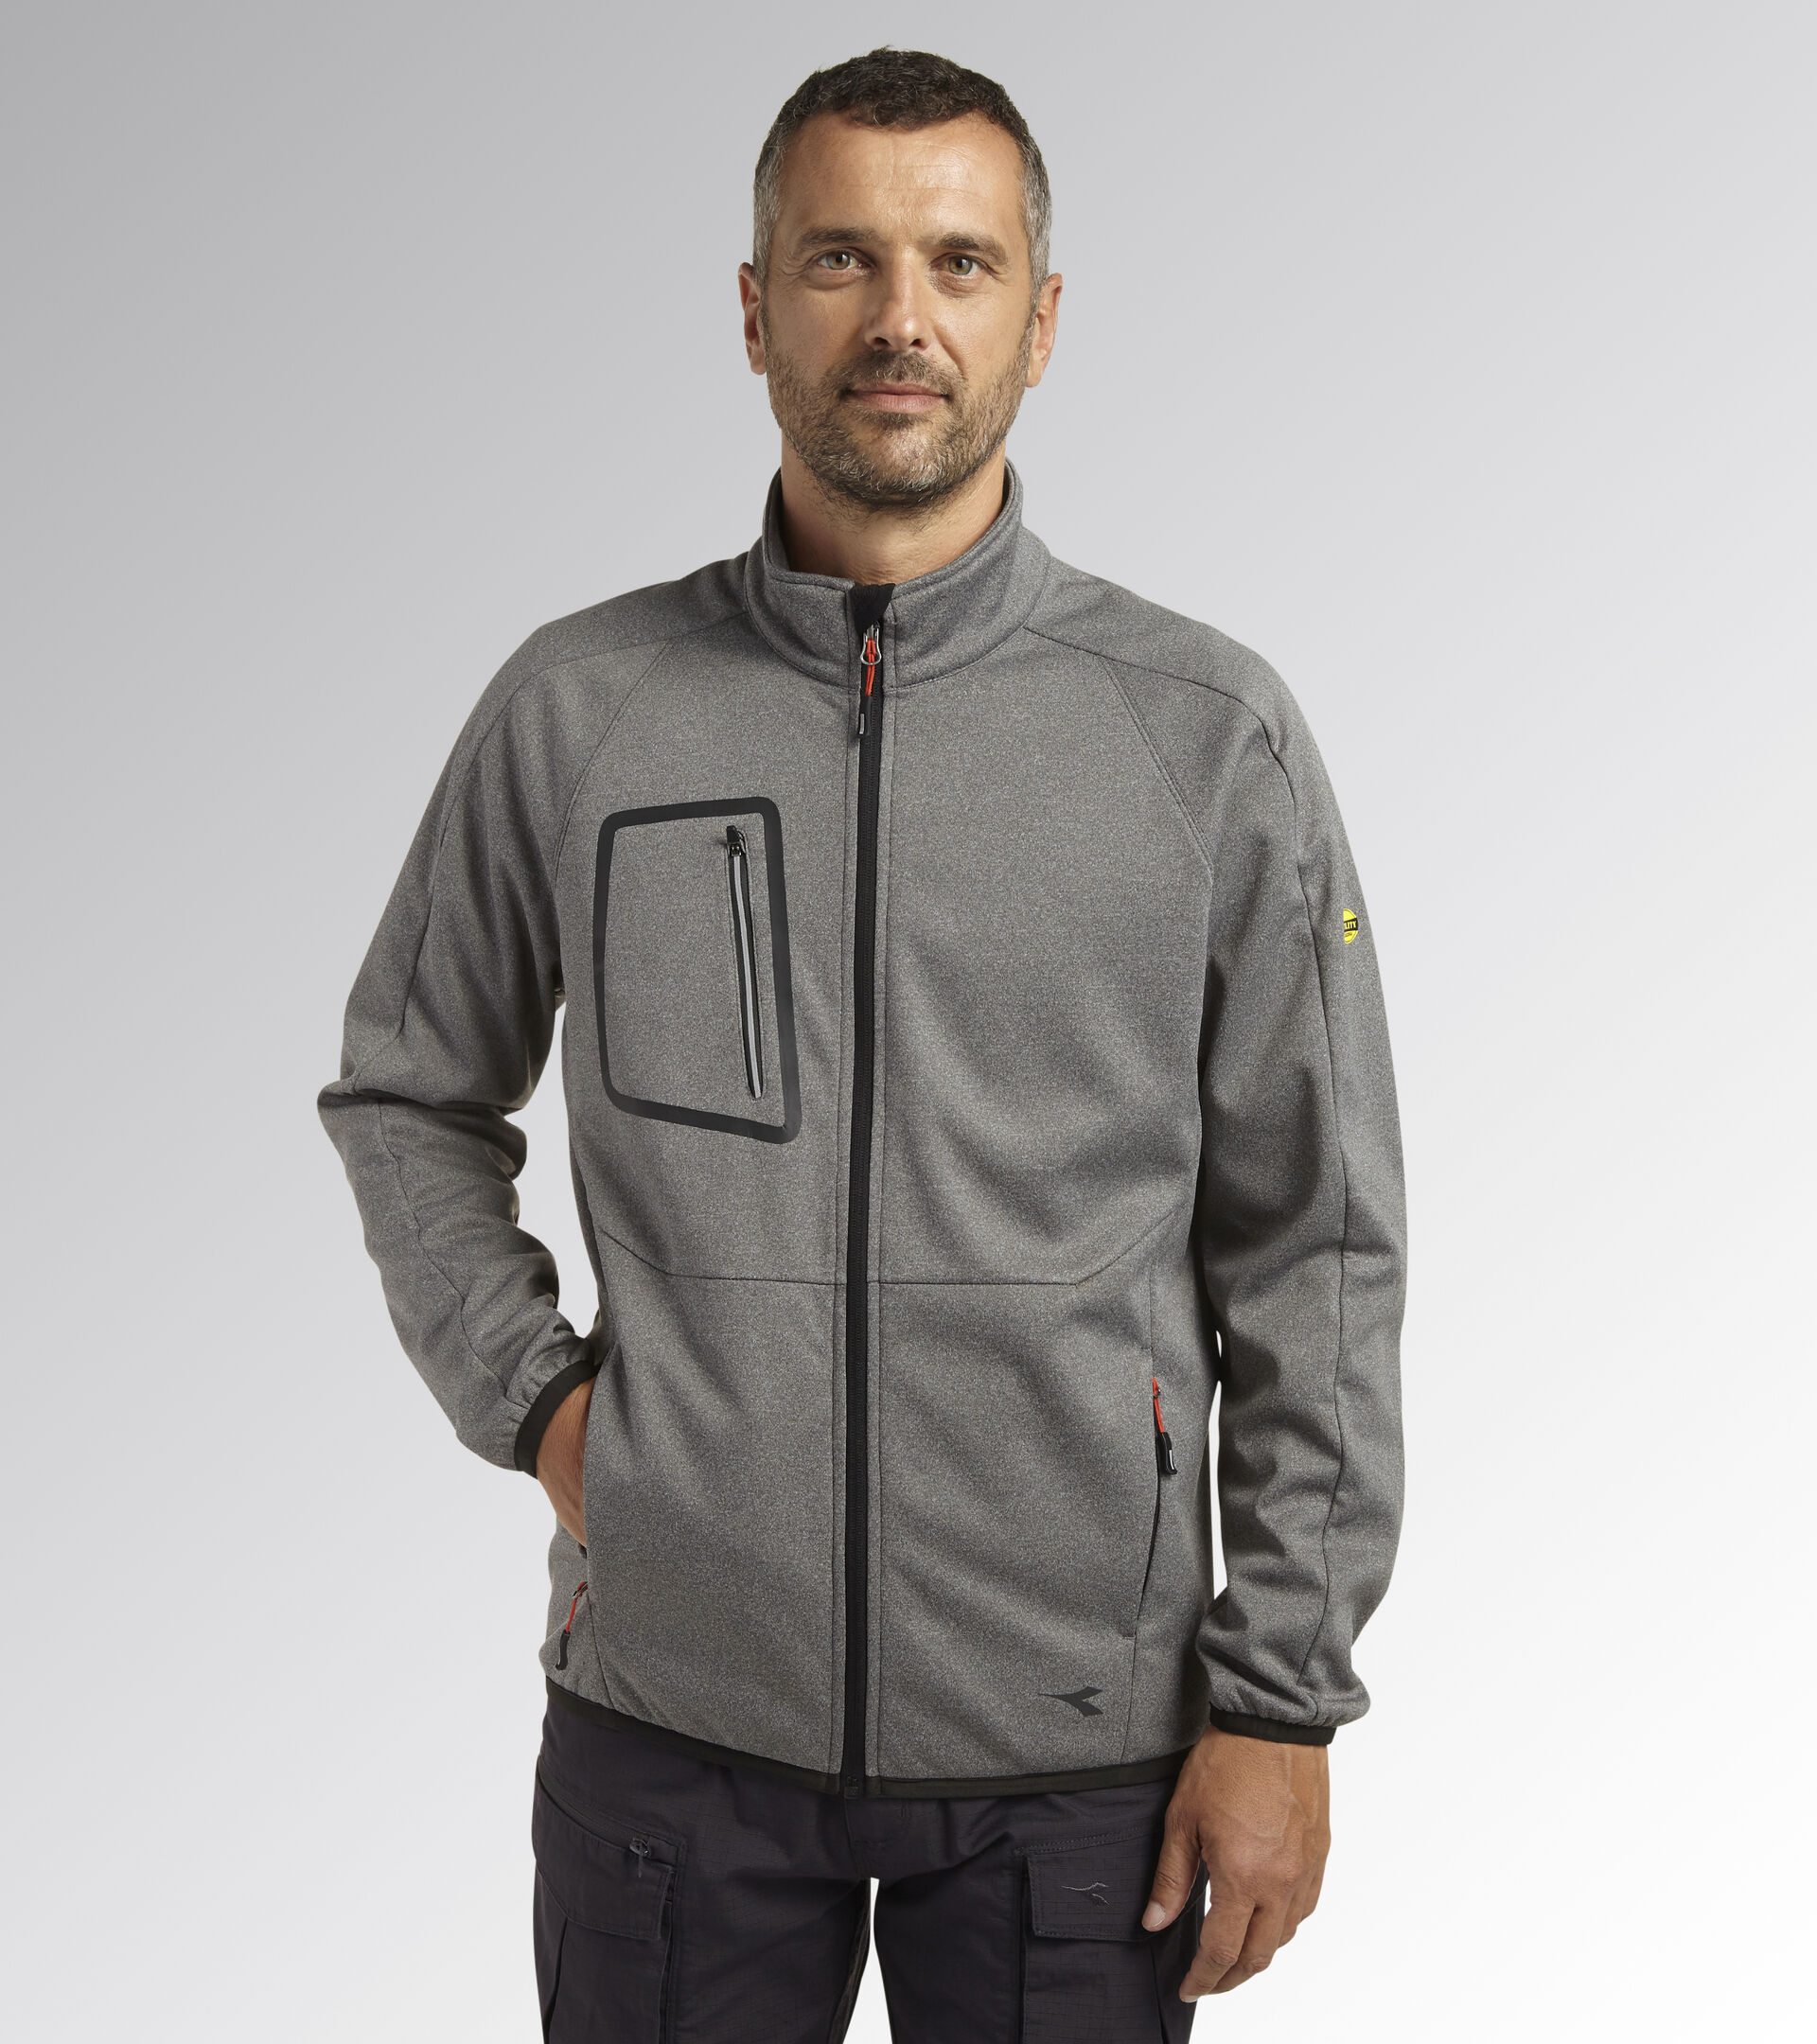 Work jacket BONDED JACKET CROSS STEEL GRAY MELANGE - Utility